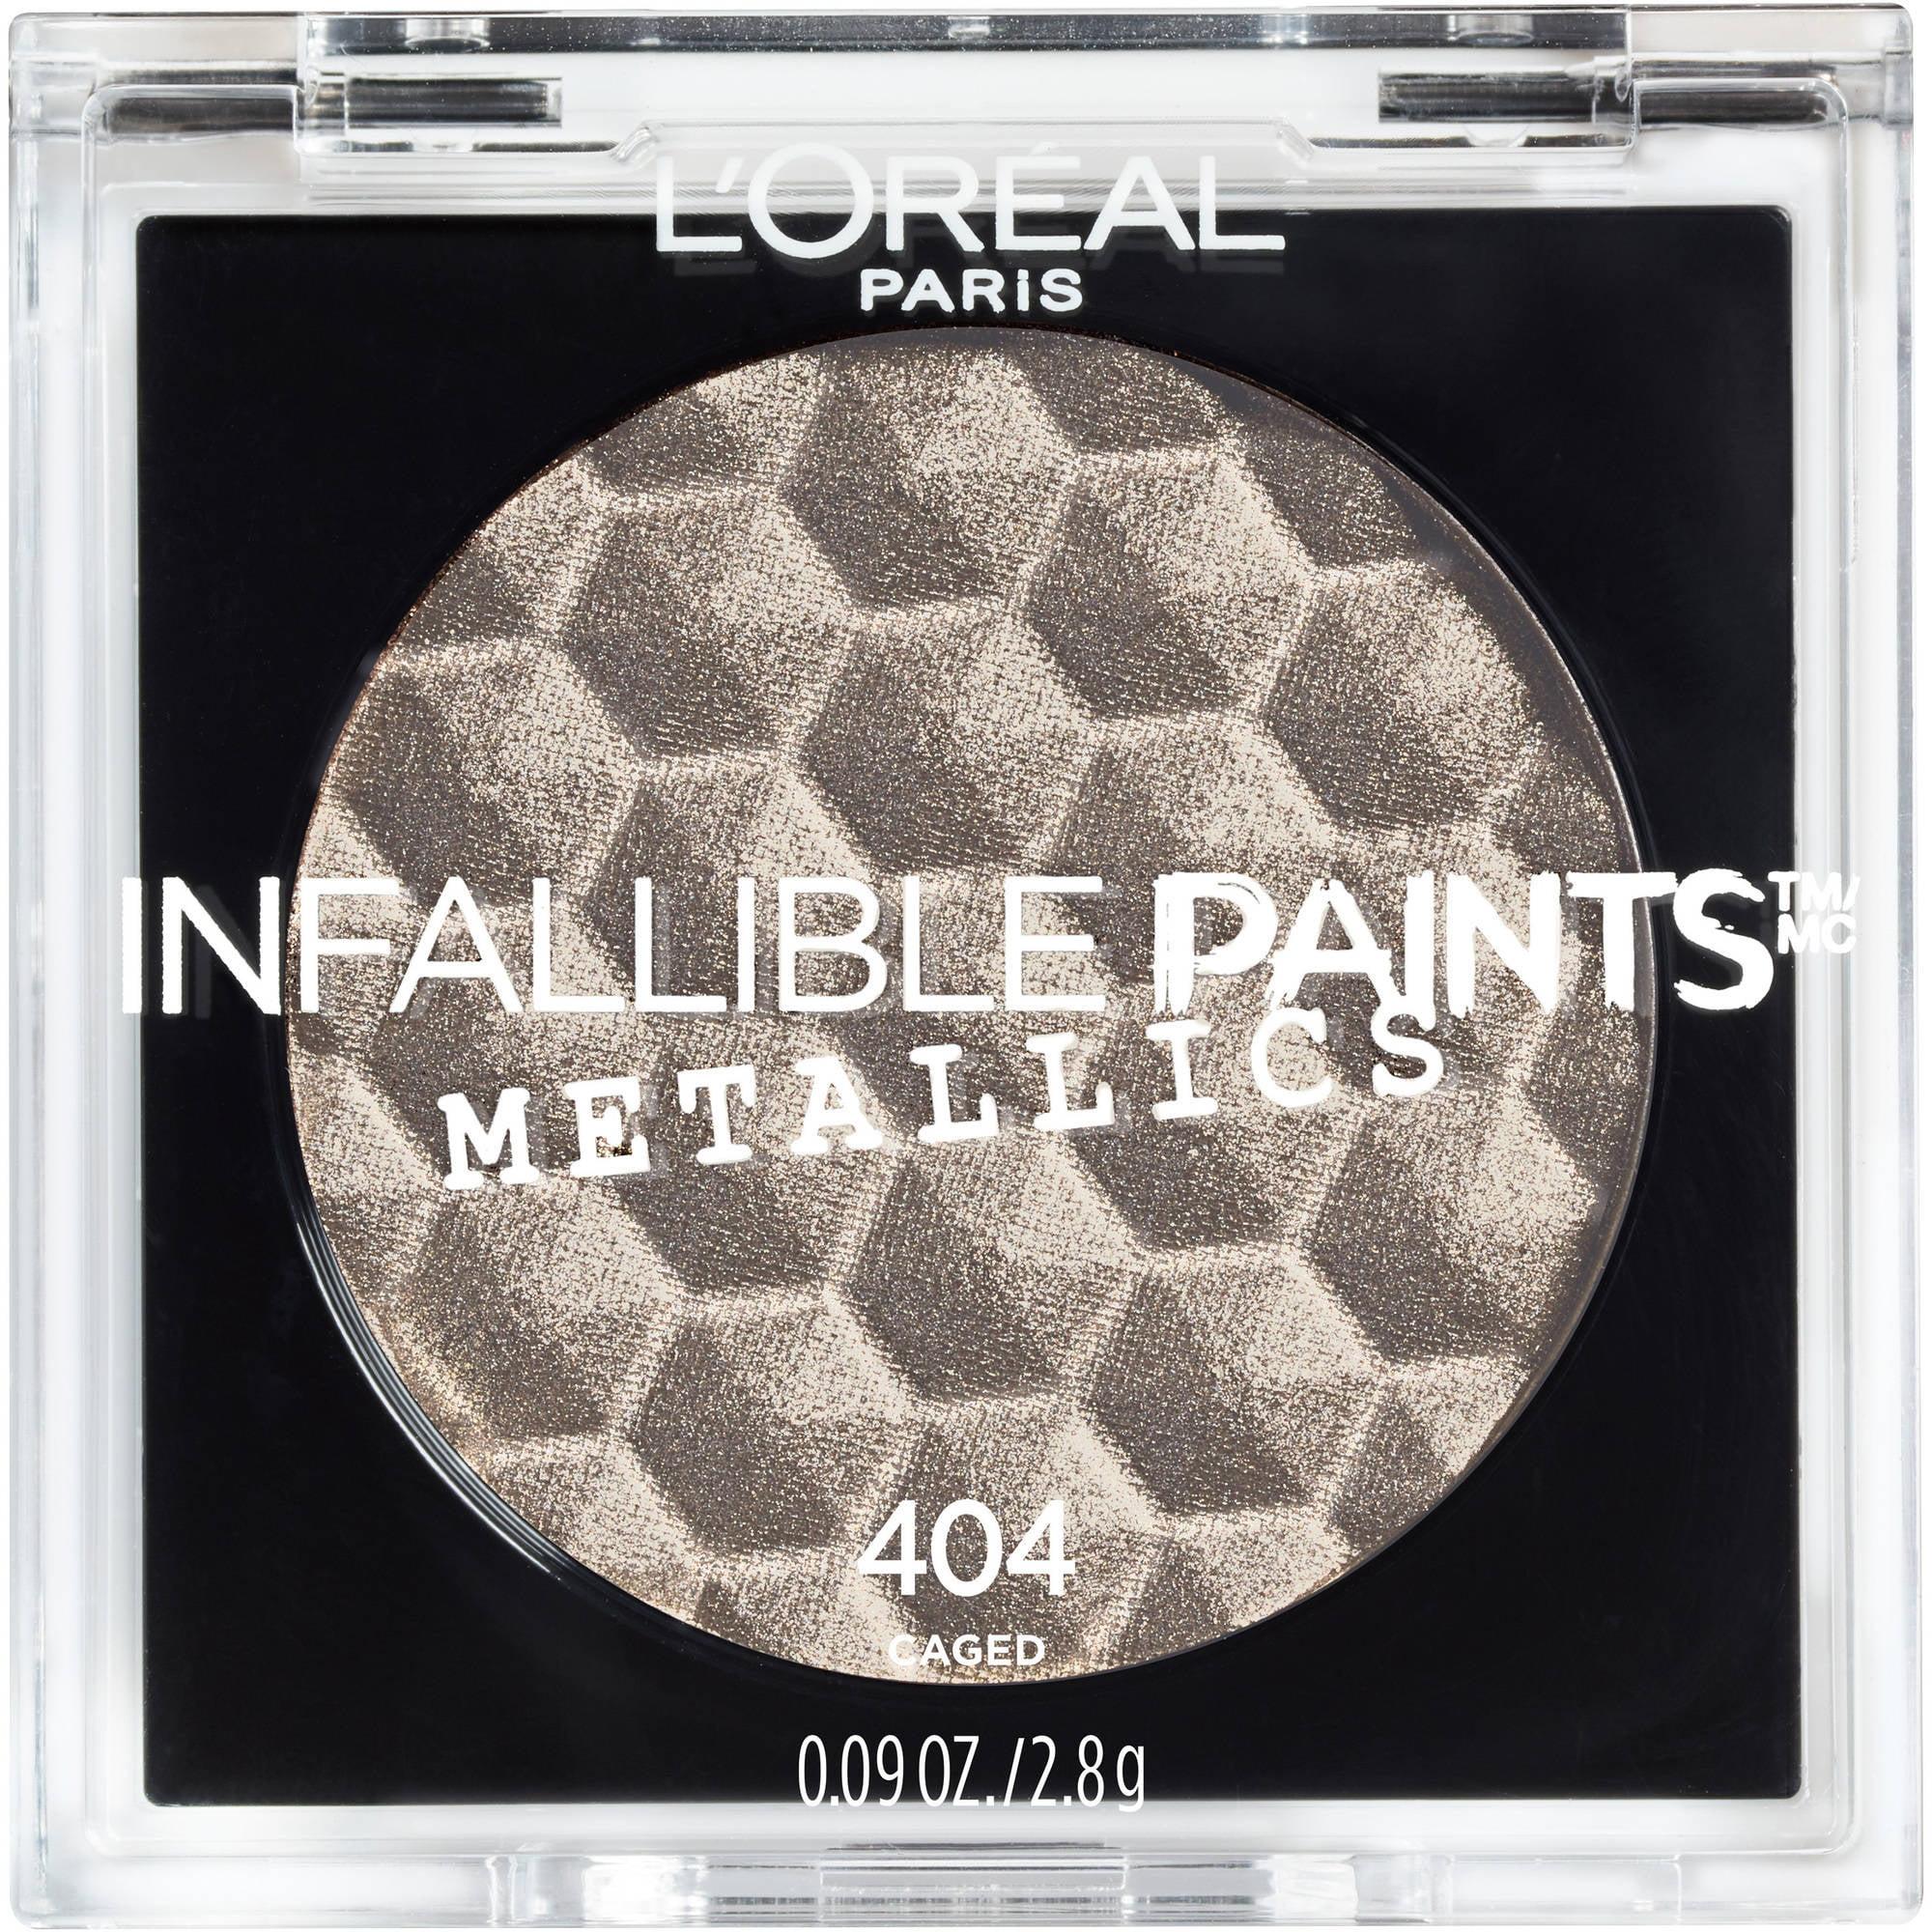 L'Oreal Paris Infallible Paints Eyeshadow Metallics